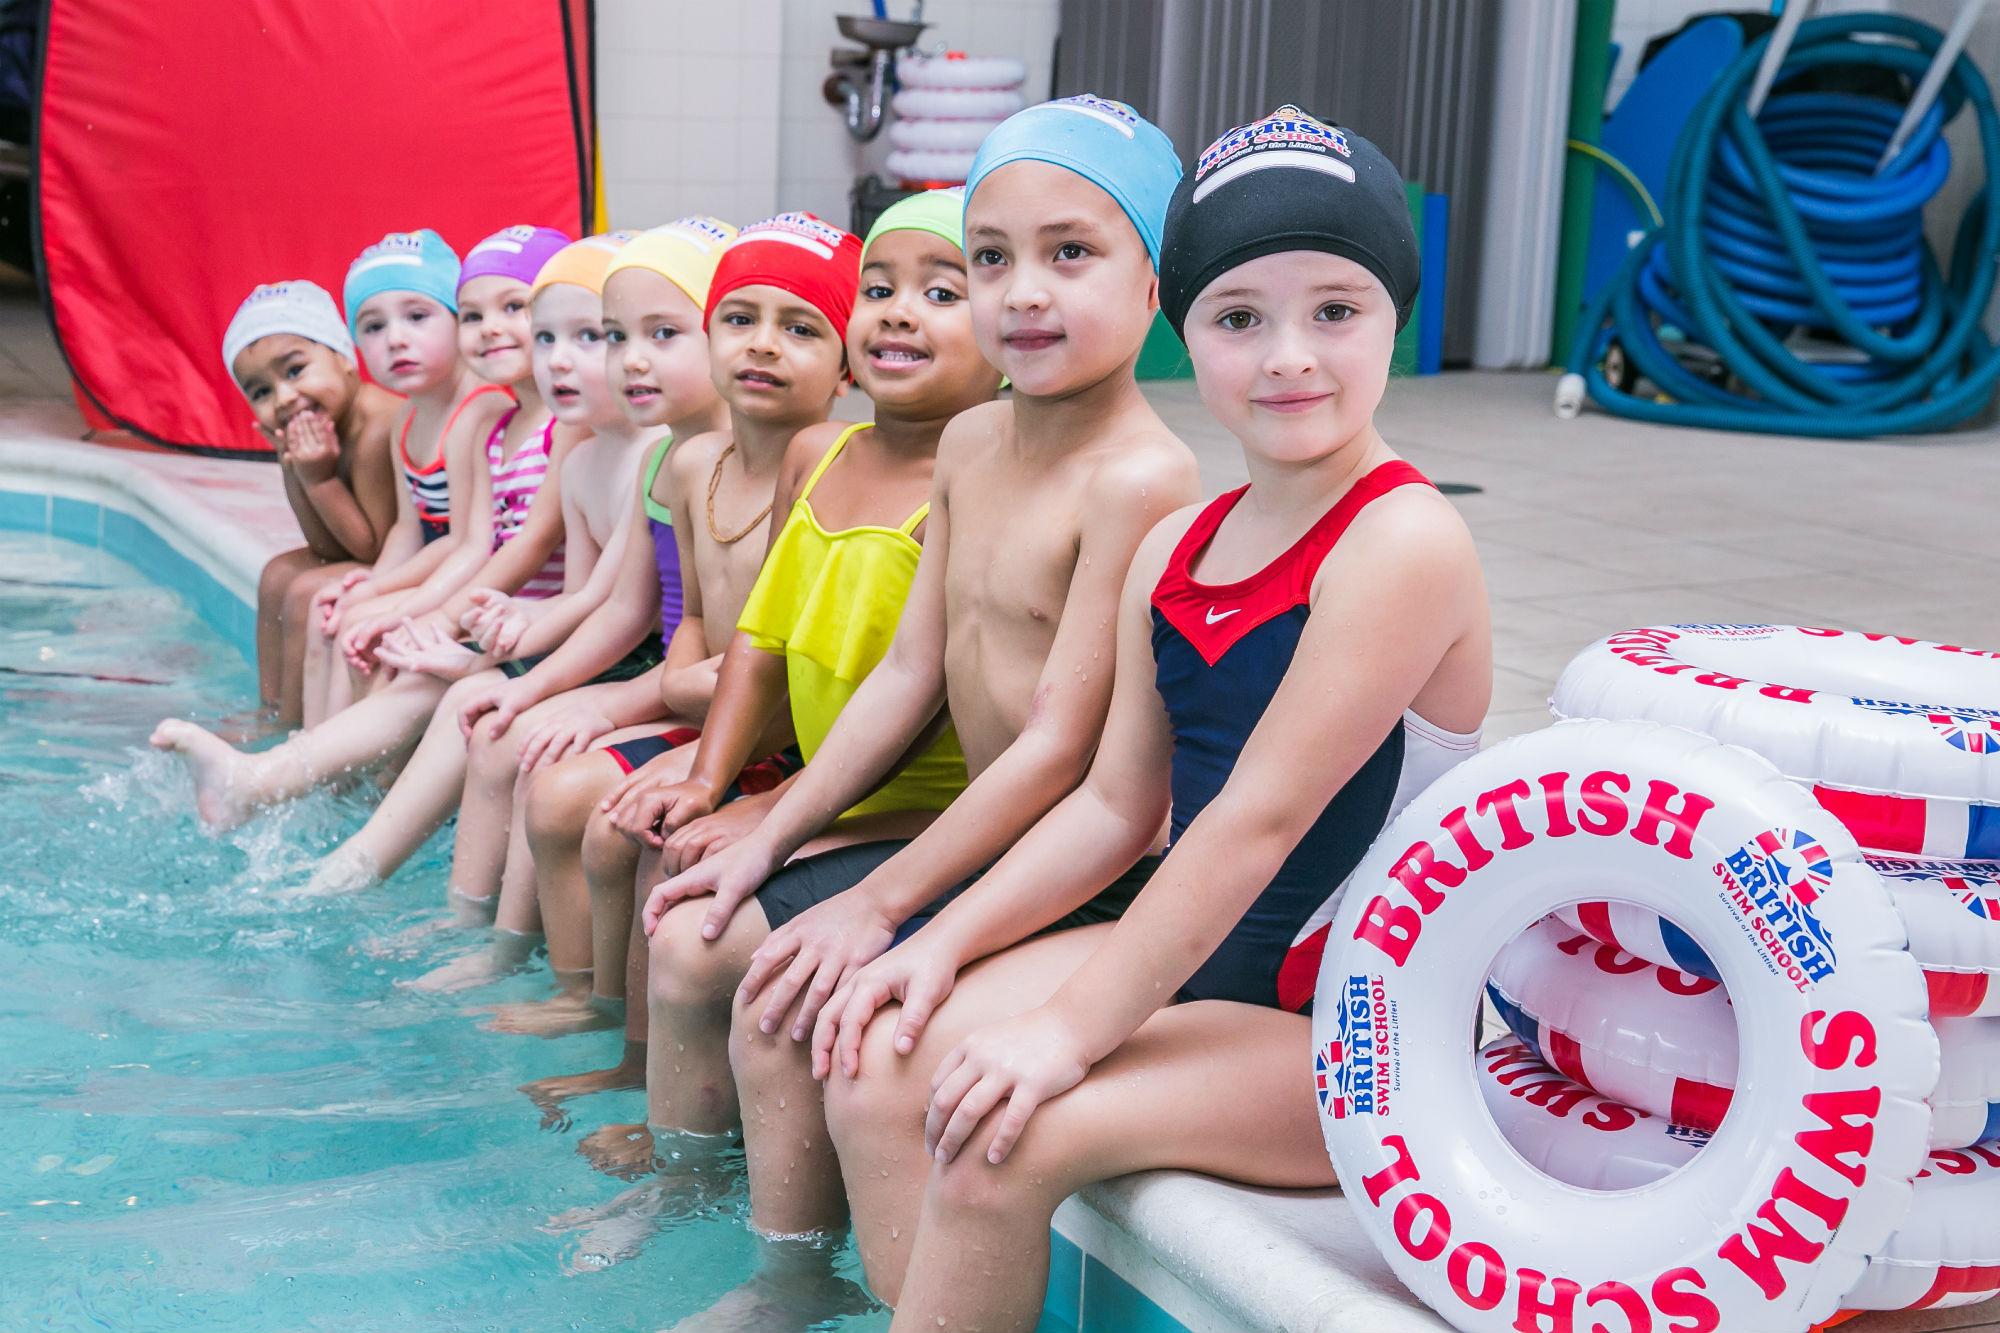 British Swim School image 2